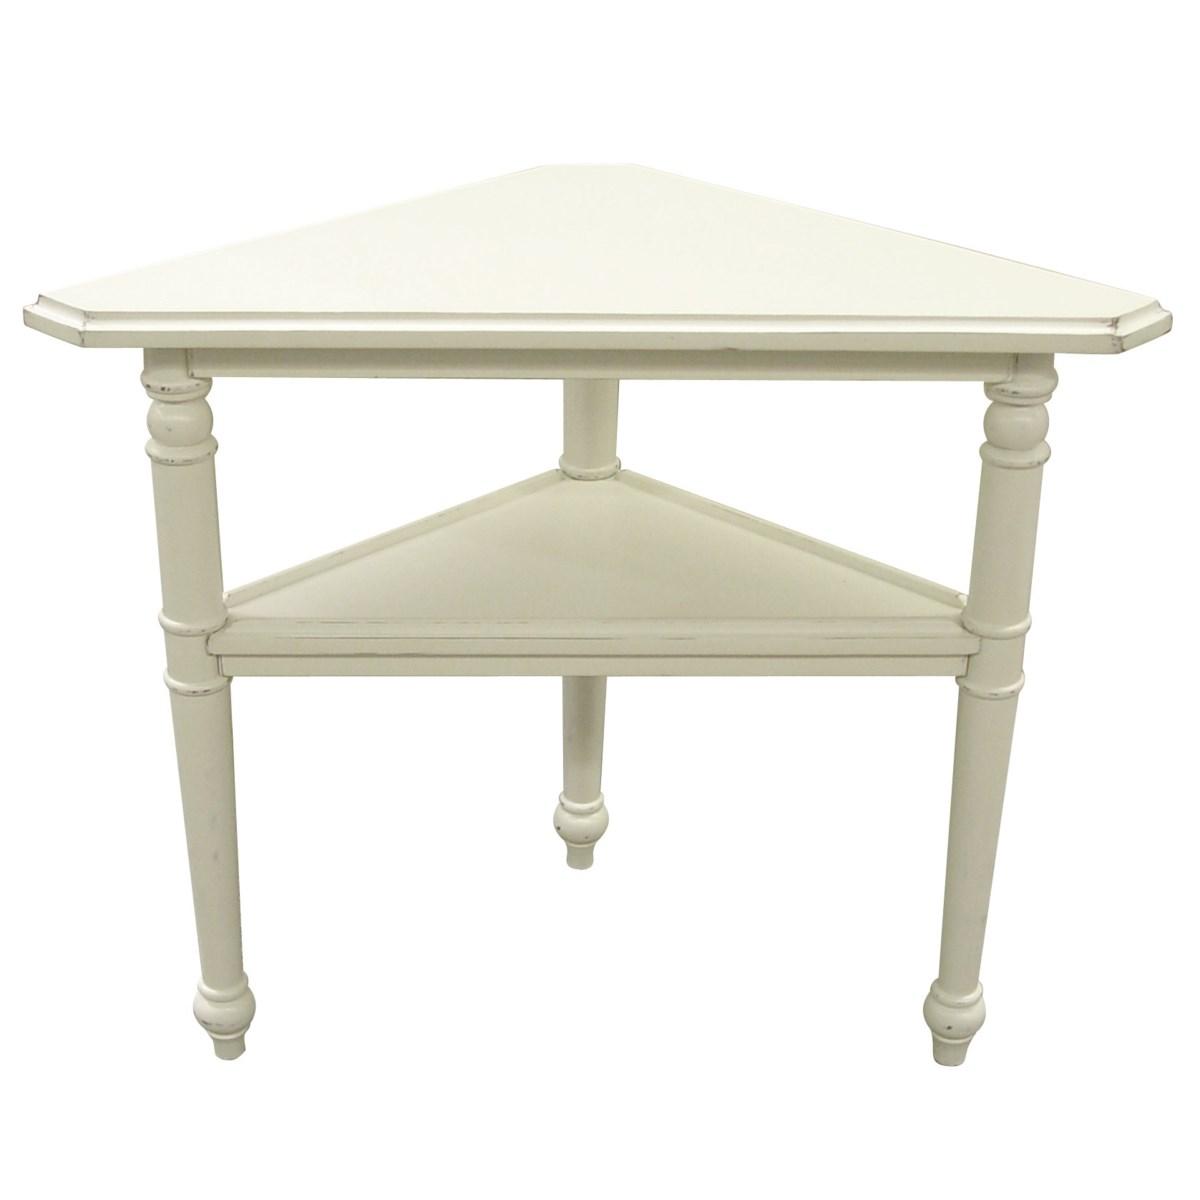 PROVENCE TRIANGLE TABLE -  WHT